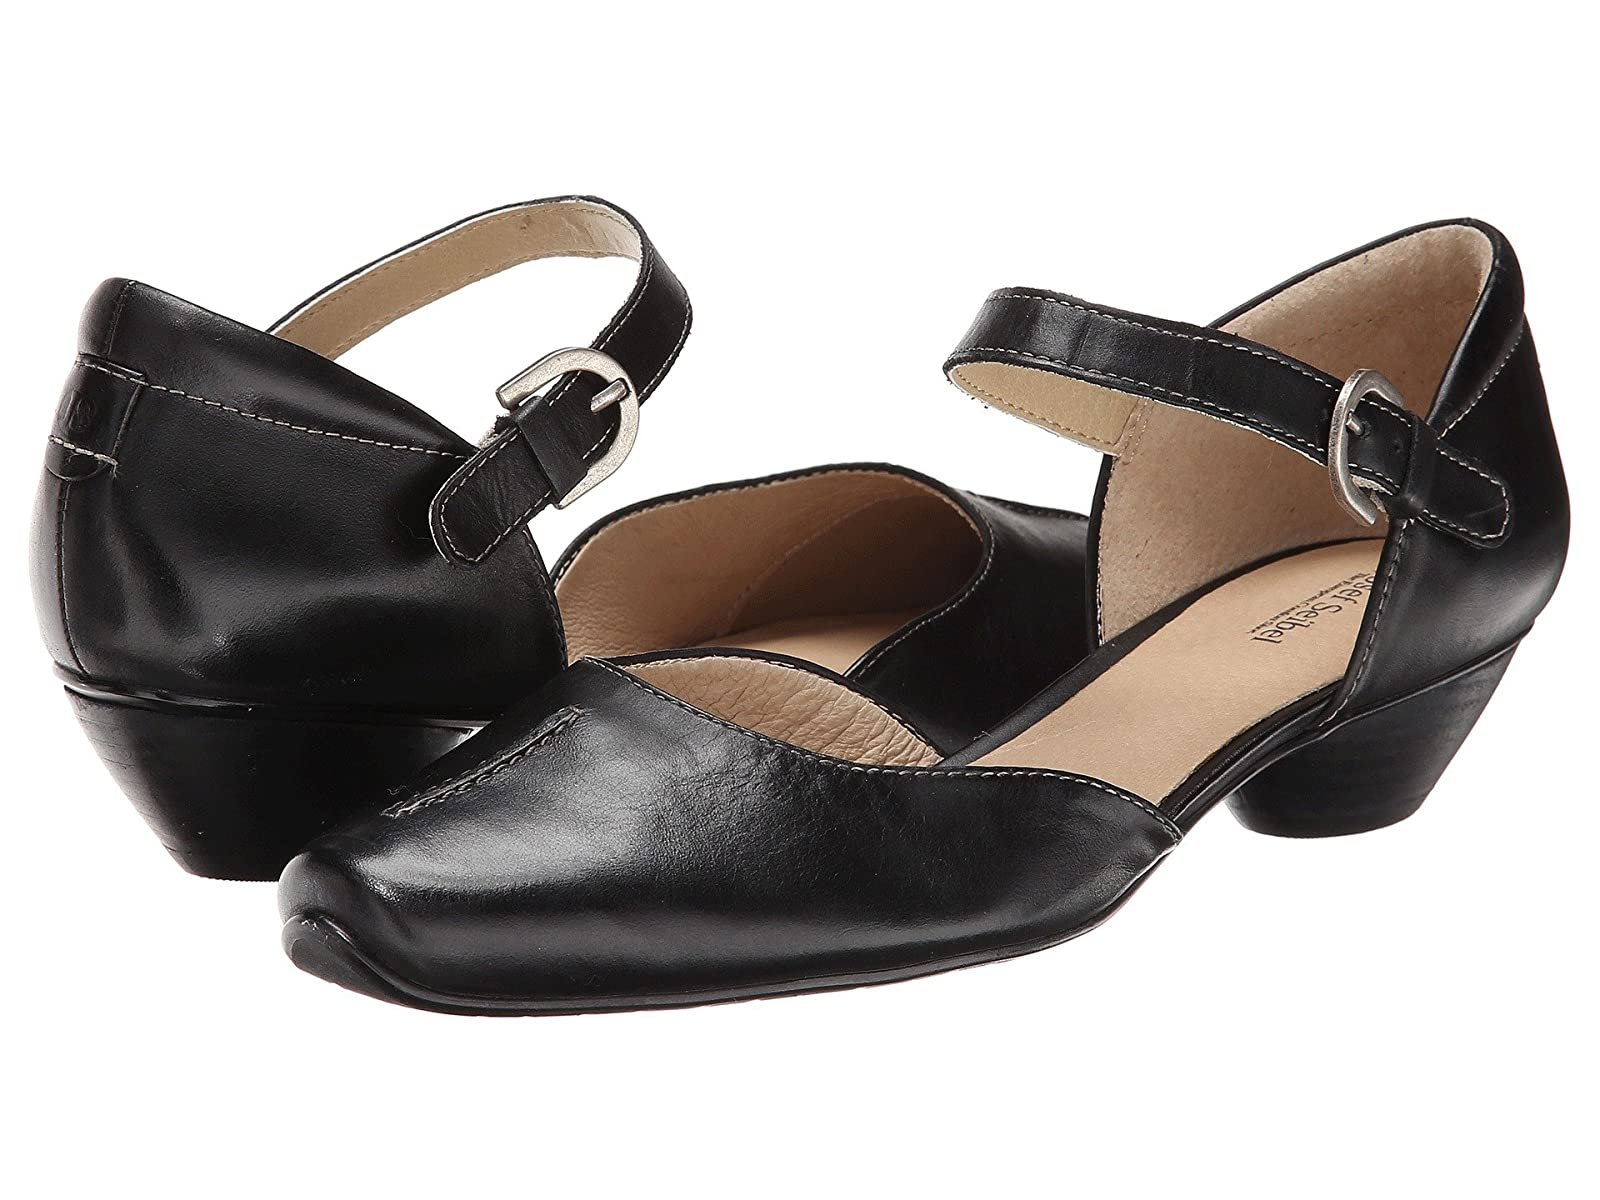 Josef Seibel Tina 17Atmospheric grades have affordable shoes